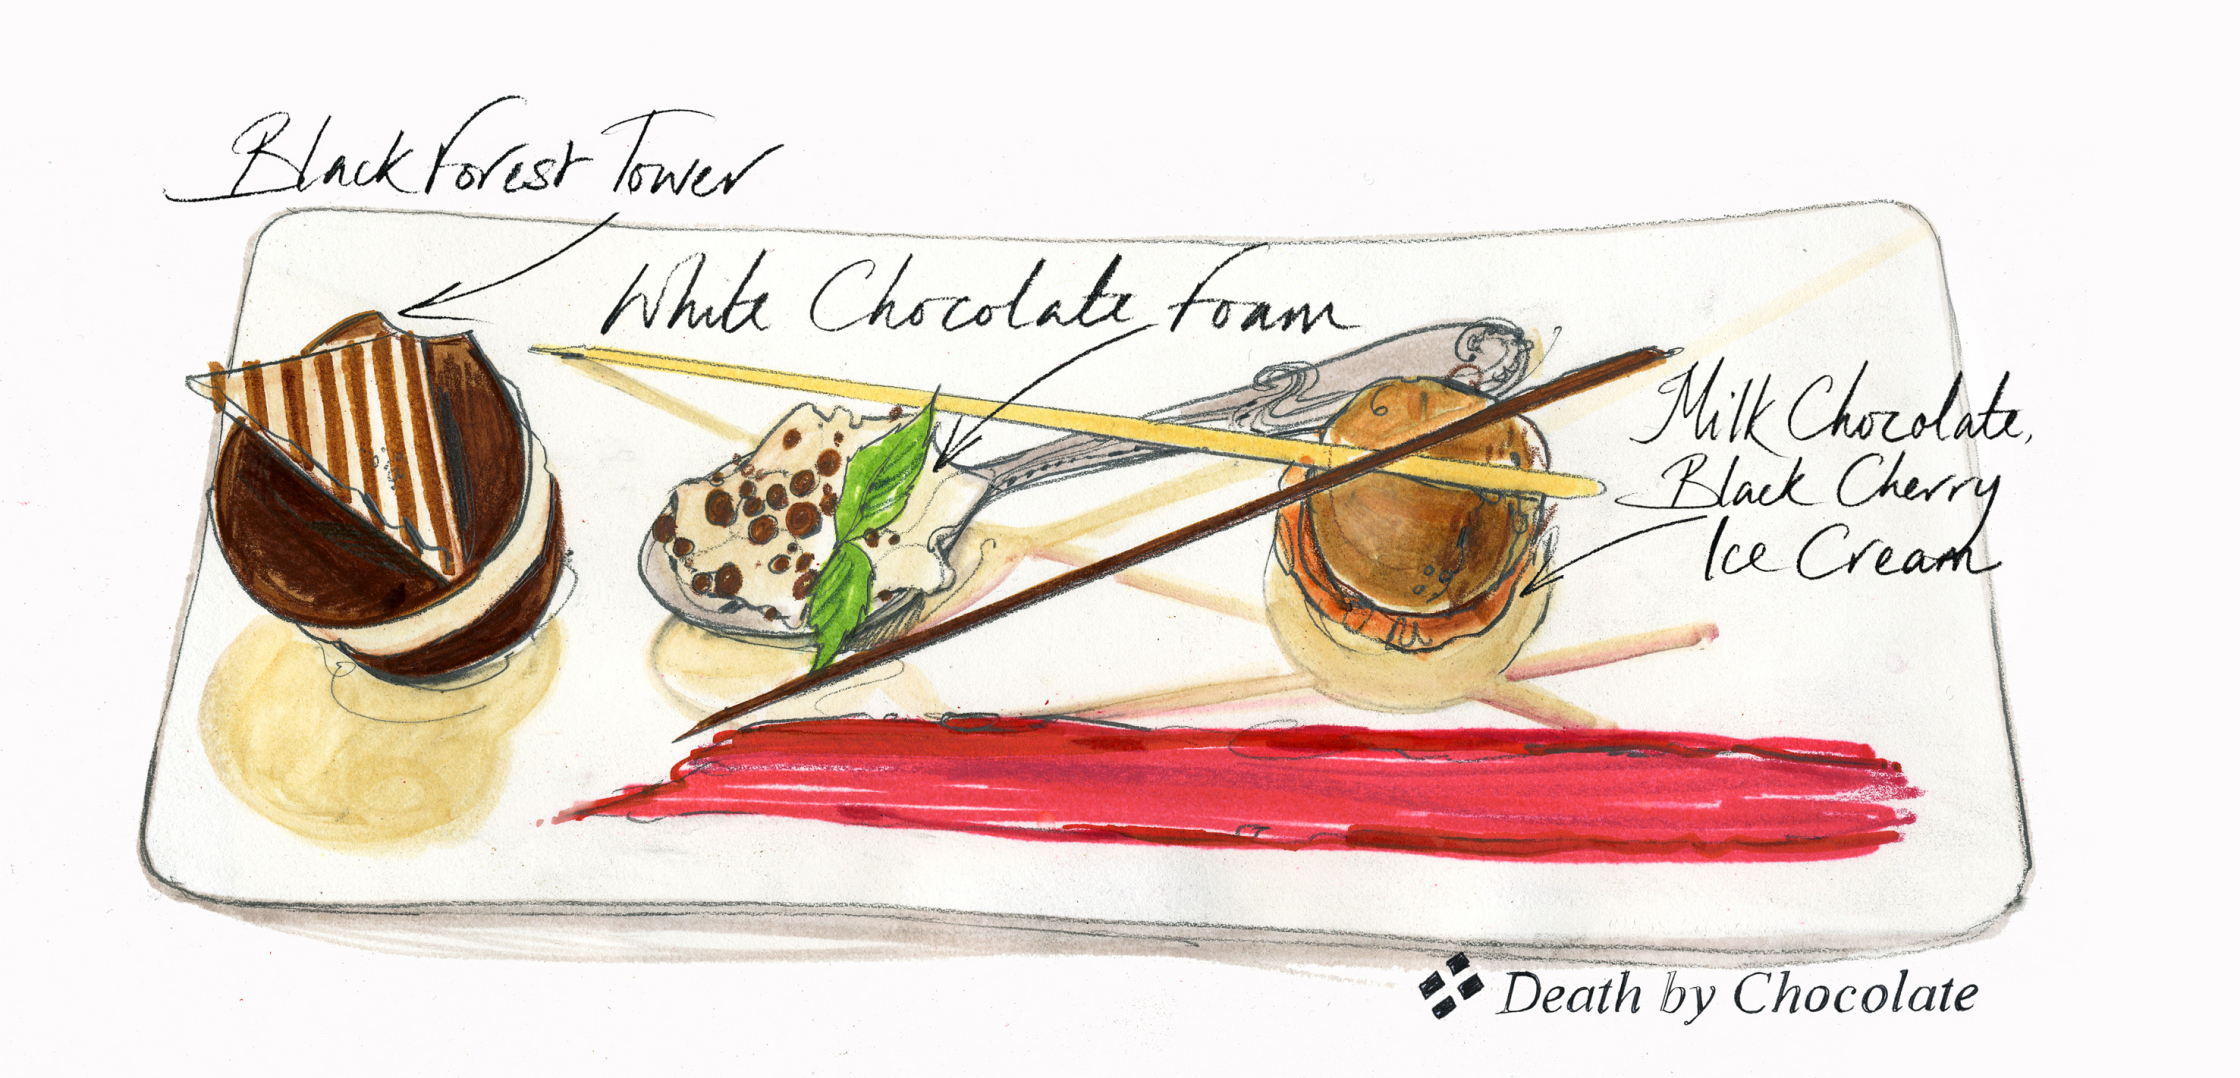 Orient Express Death by Chocolate.jpg